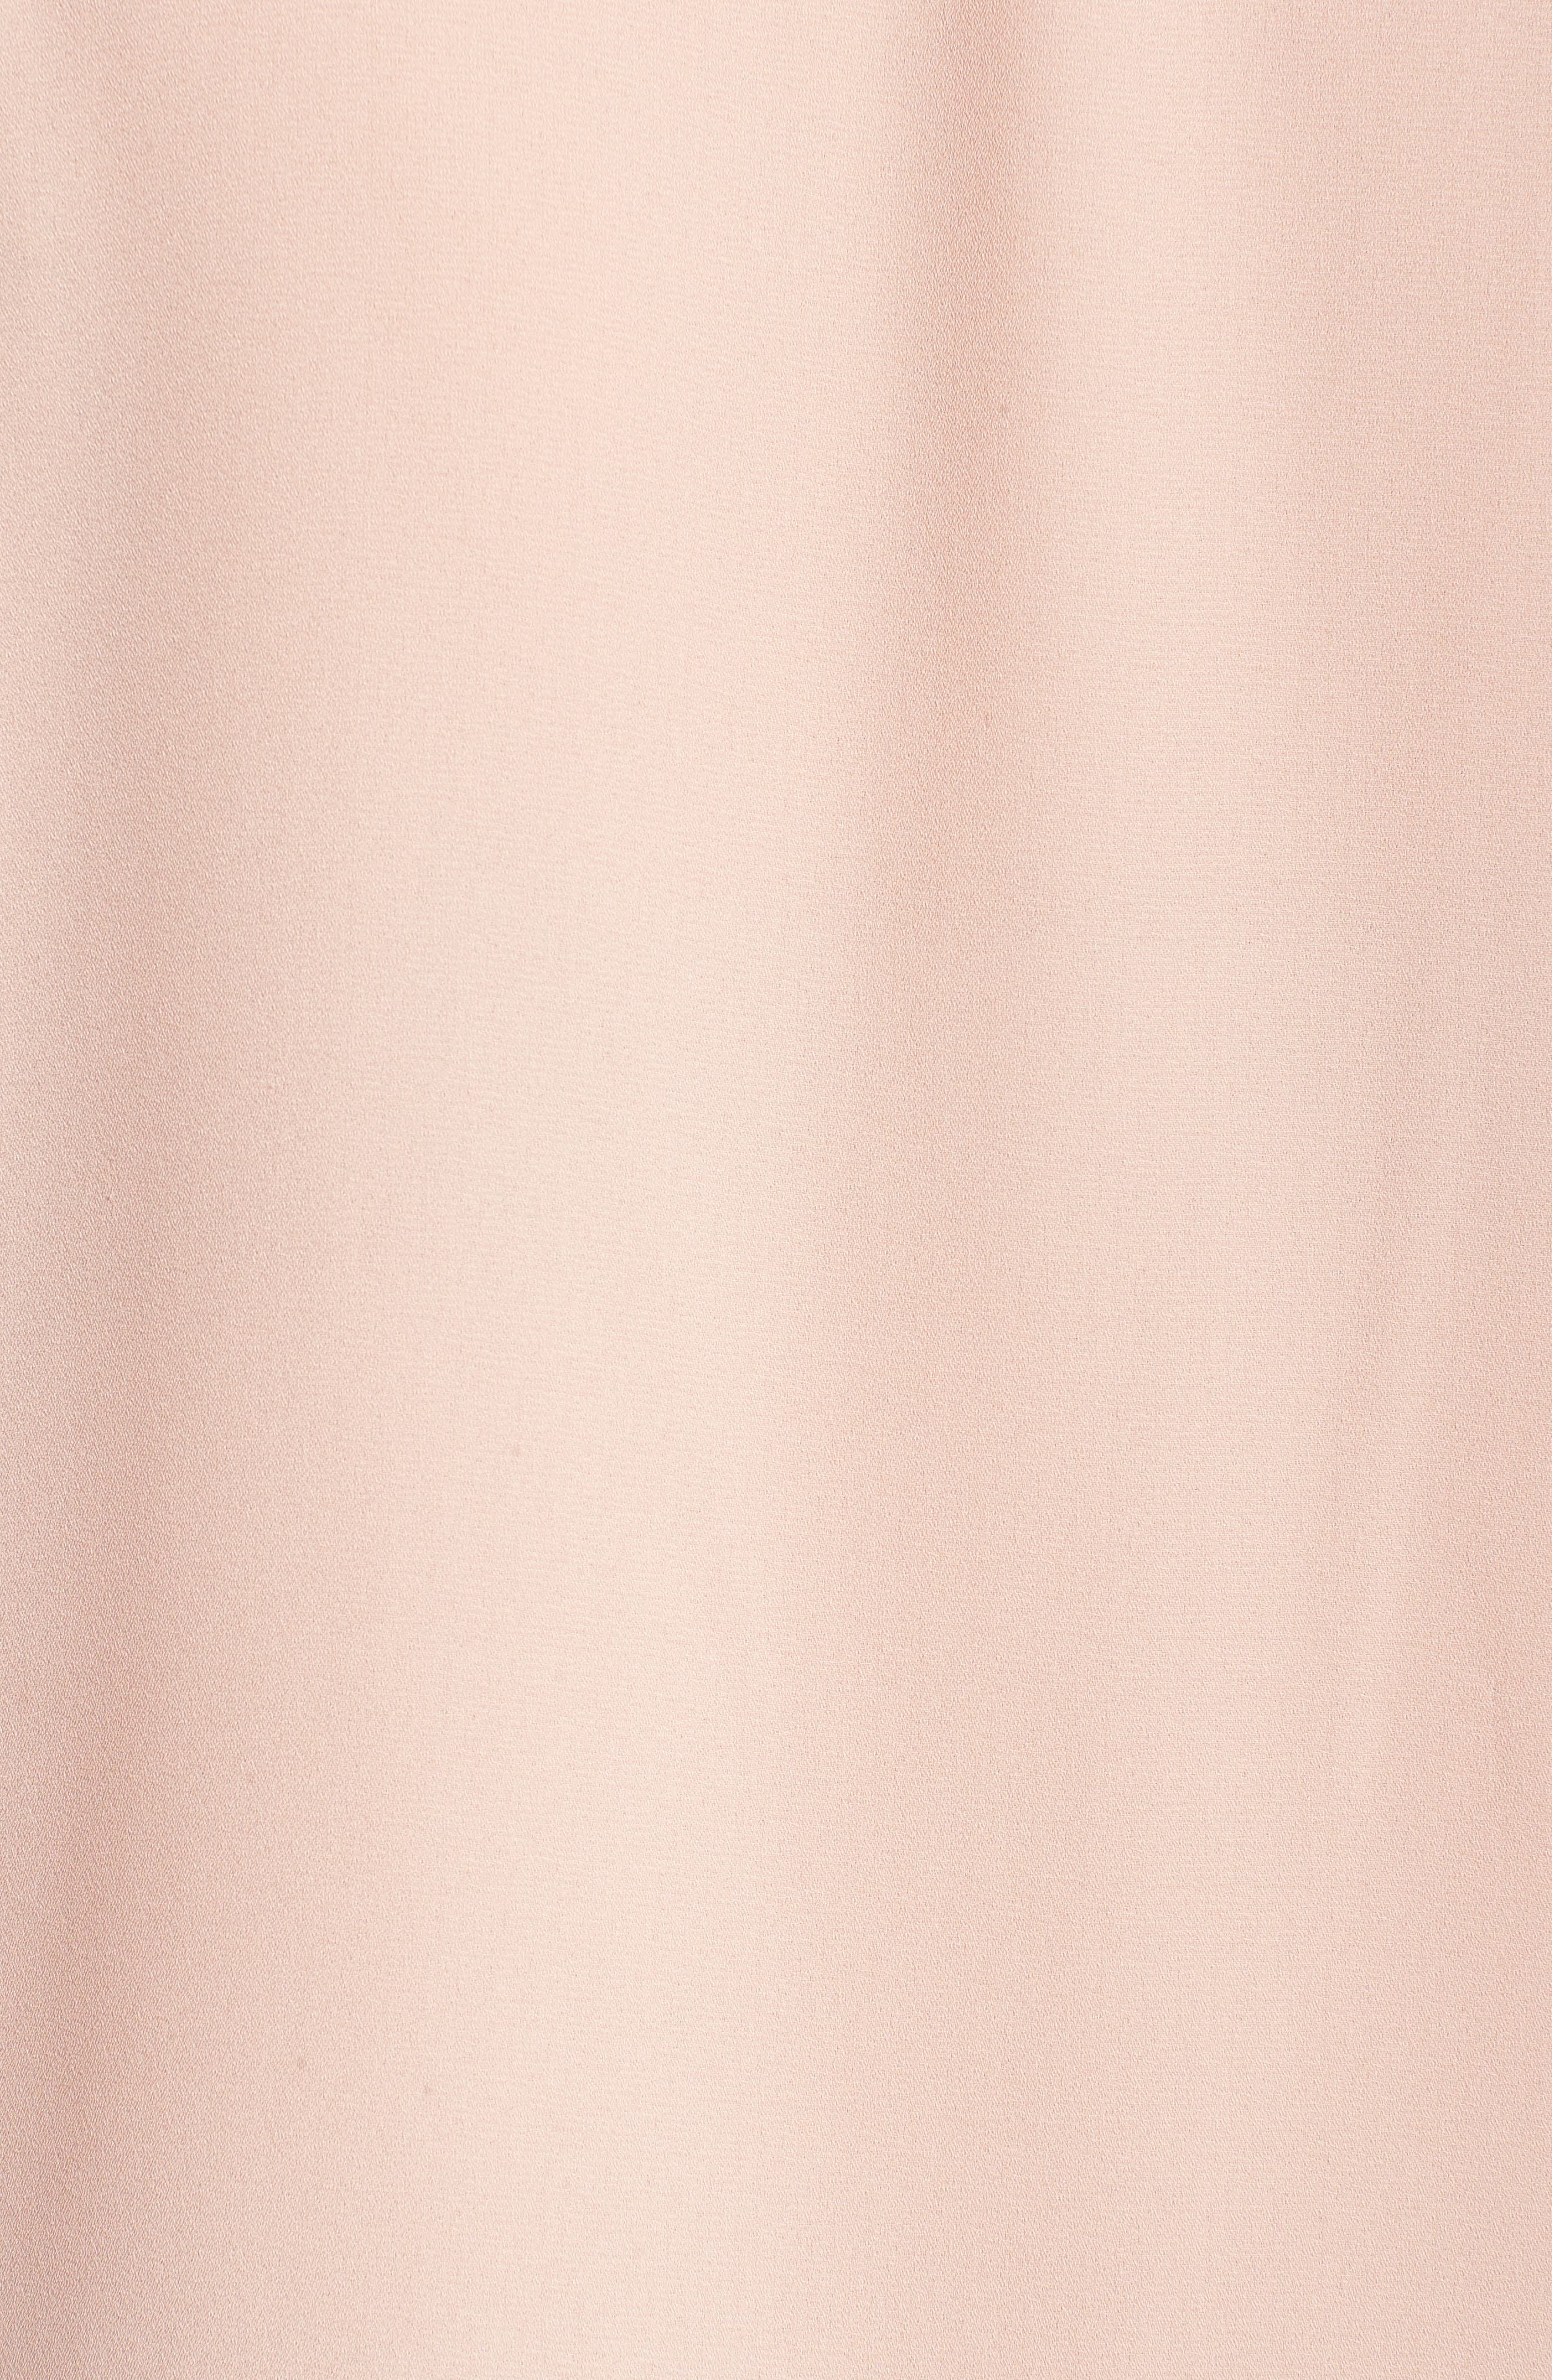 Embroidered Yoke Cap Sleeve Blouse,                             Alternate thumbnail 5, color,                             Blush